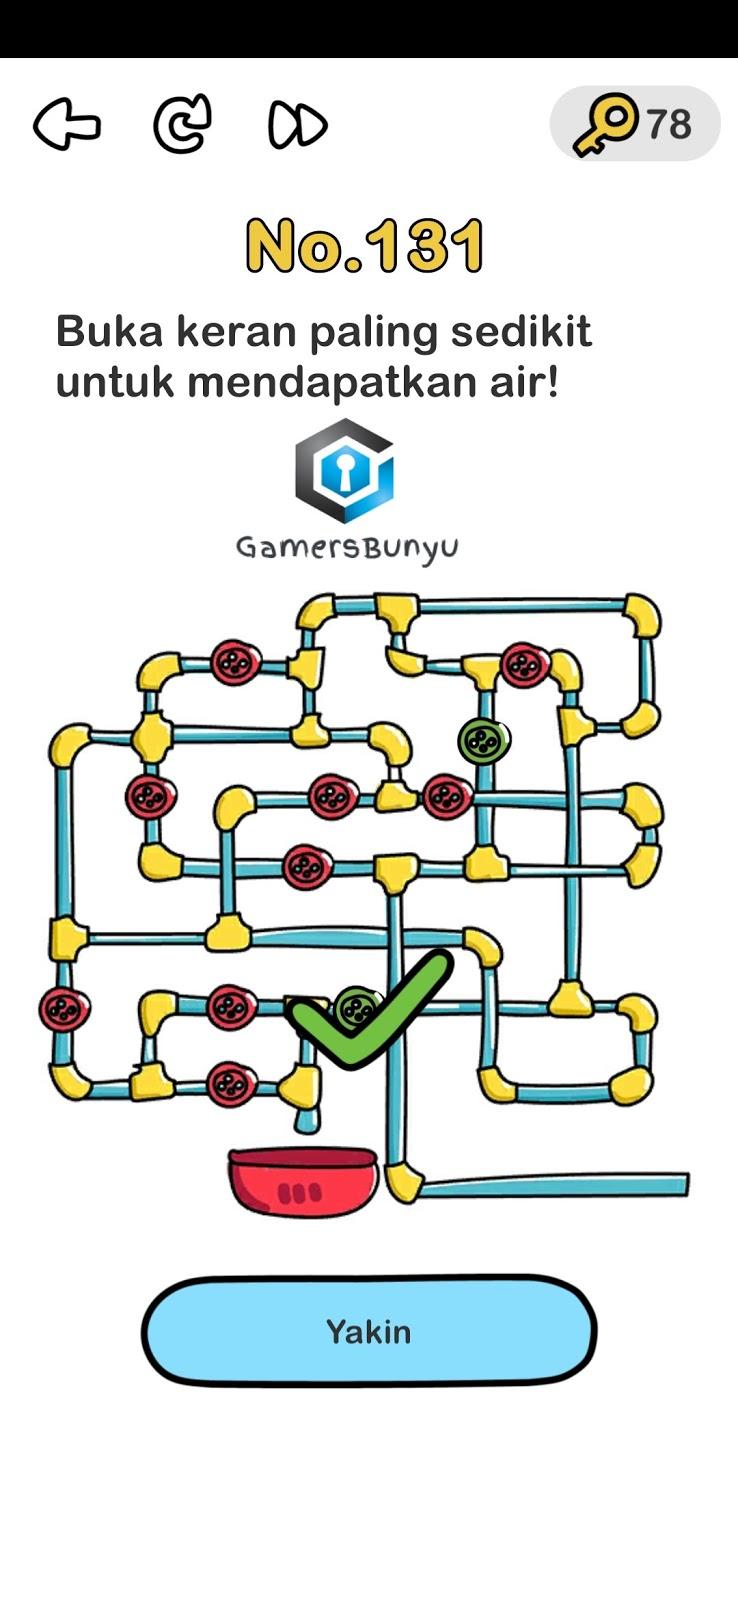 Kunci Jawaban Brain Out Level 136 : kunci, jawaban, brain, level, Jawaban, Brain, Level, Gamers, Bunyu